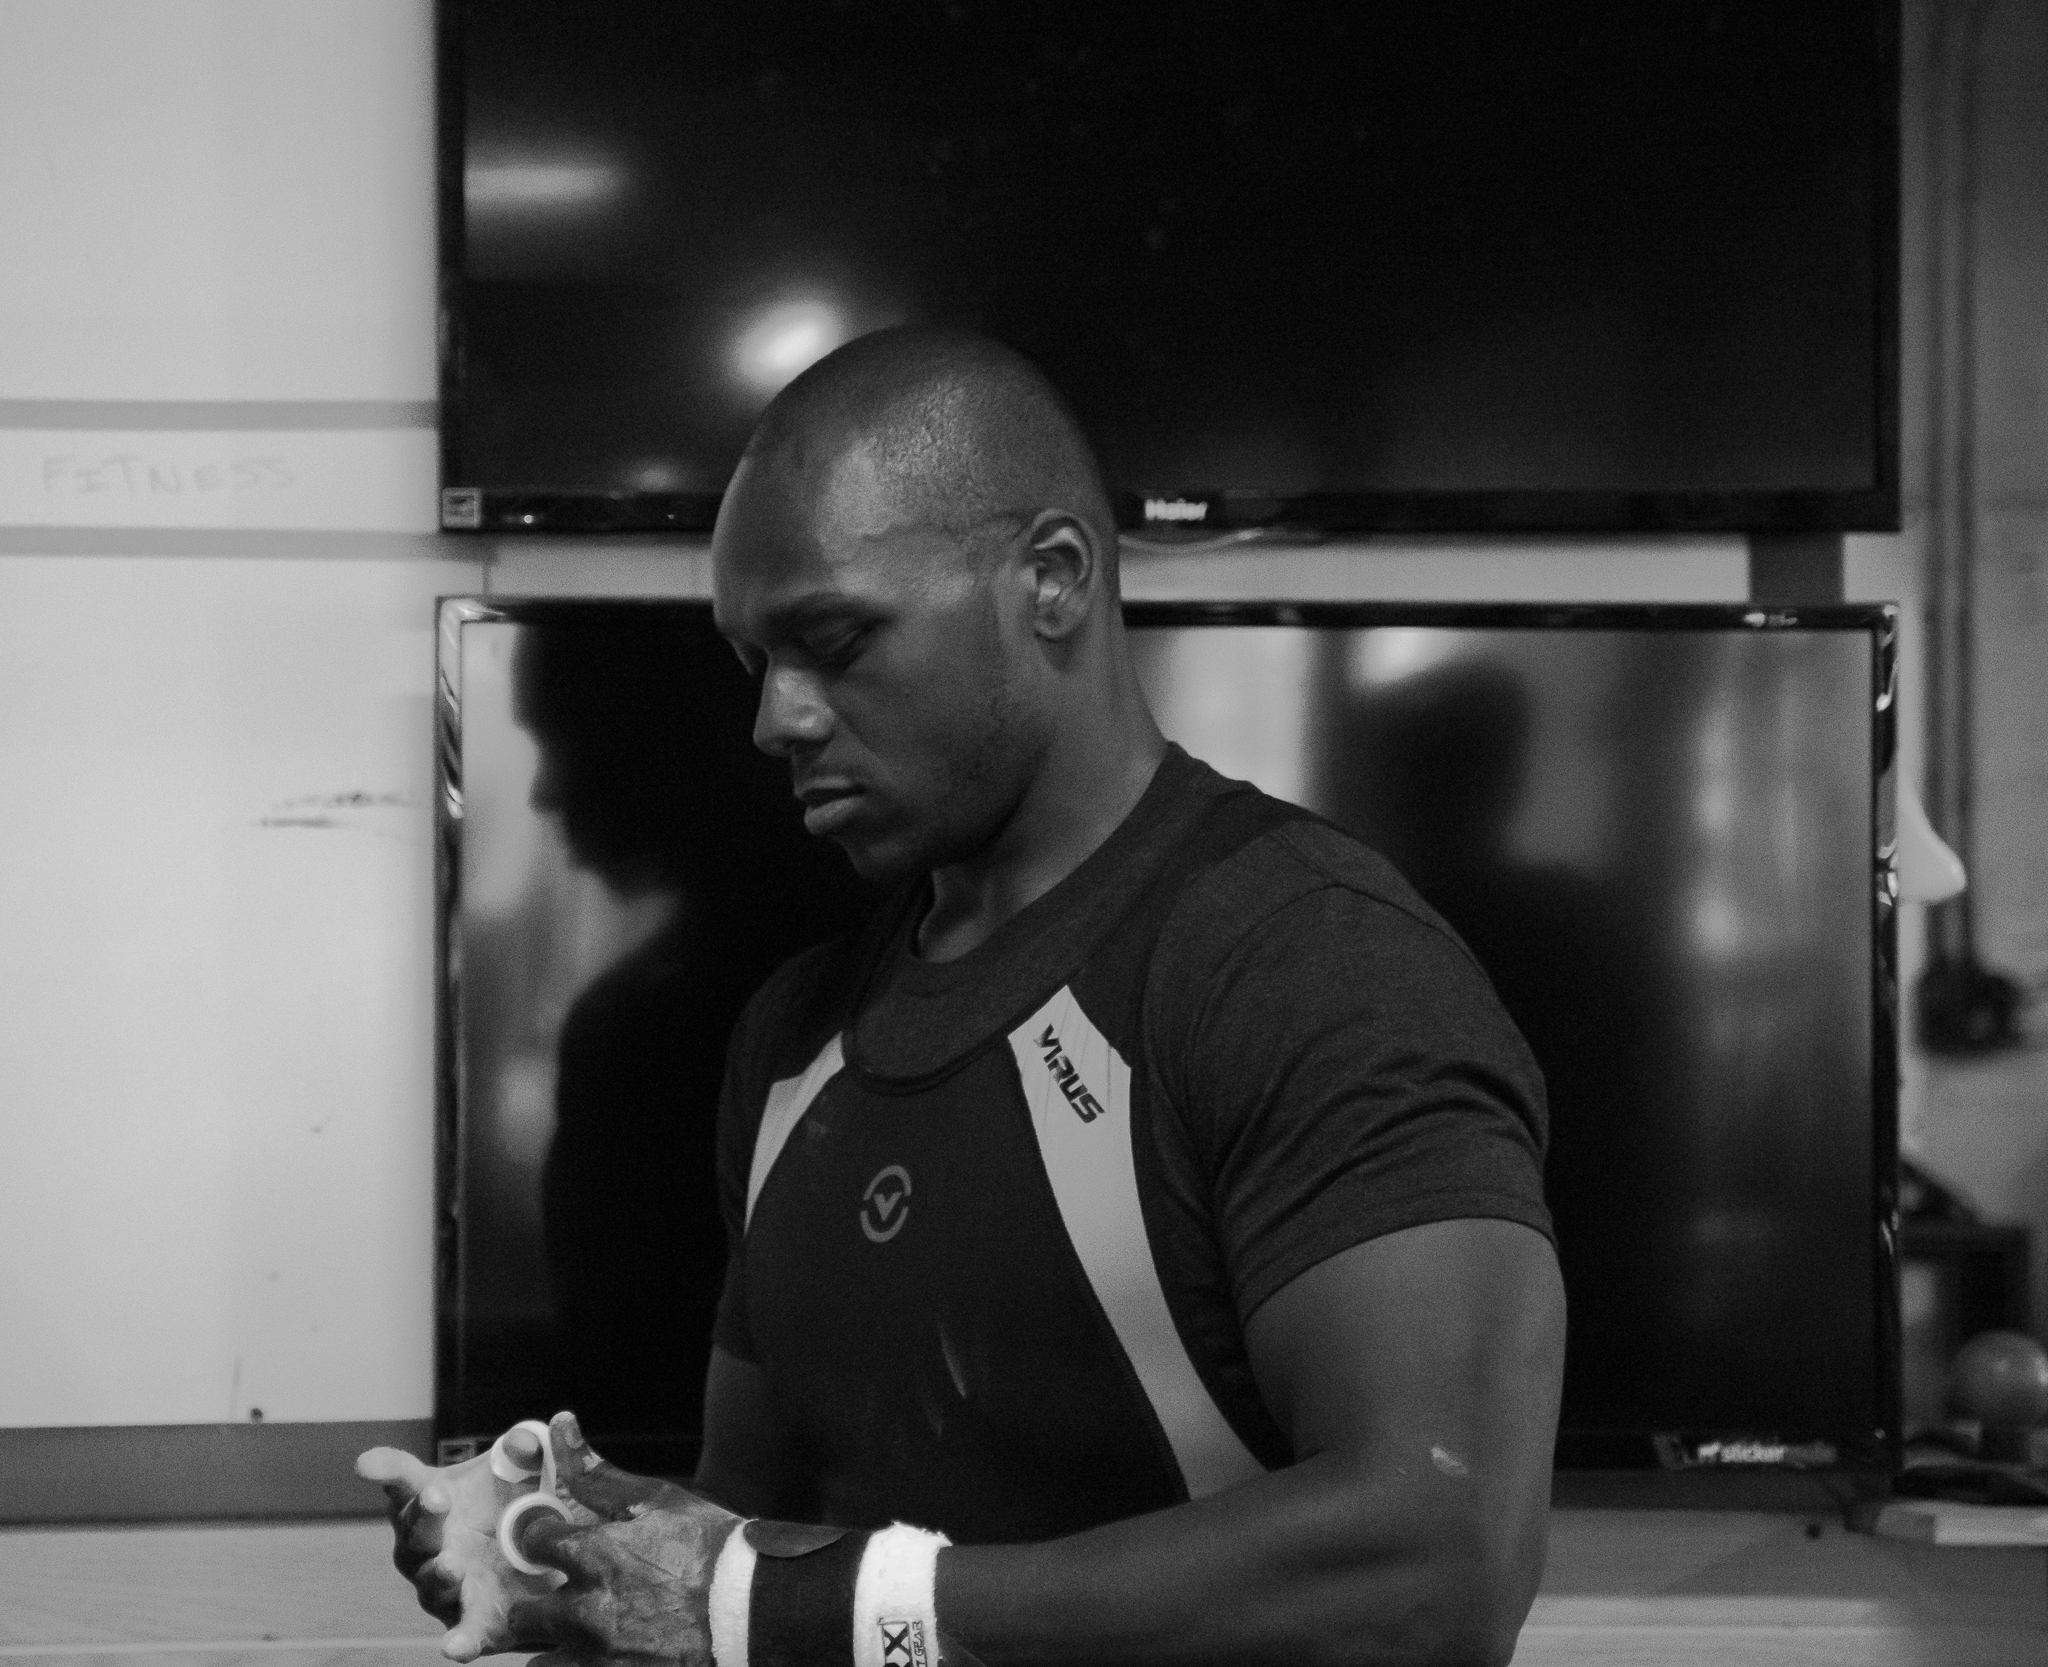 men-warwick-new-york-intrepid-strength-conditioning-winter-open-weightlifting-meet-weightlifting-photography (15 of 24).jpg